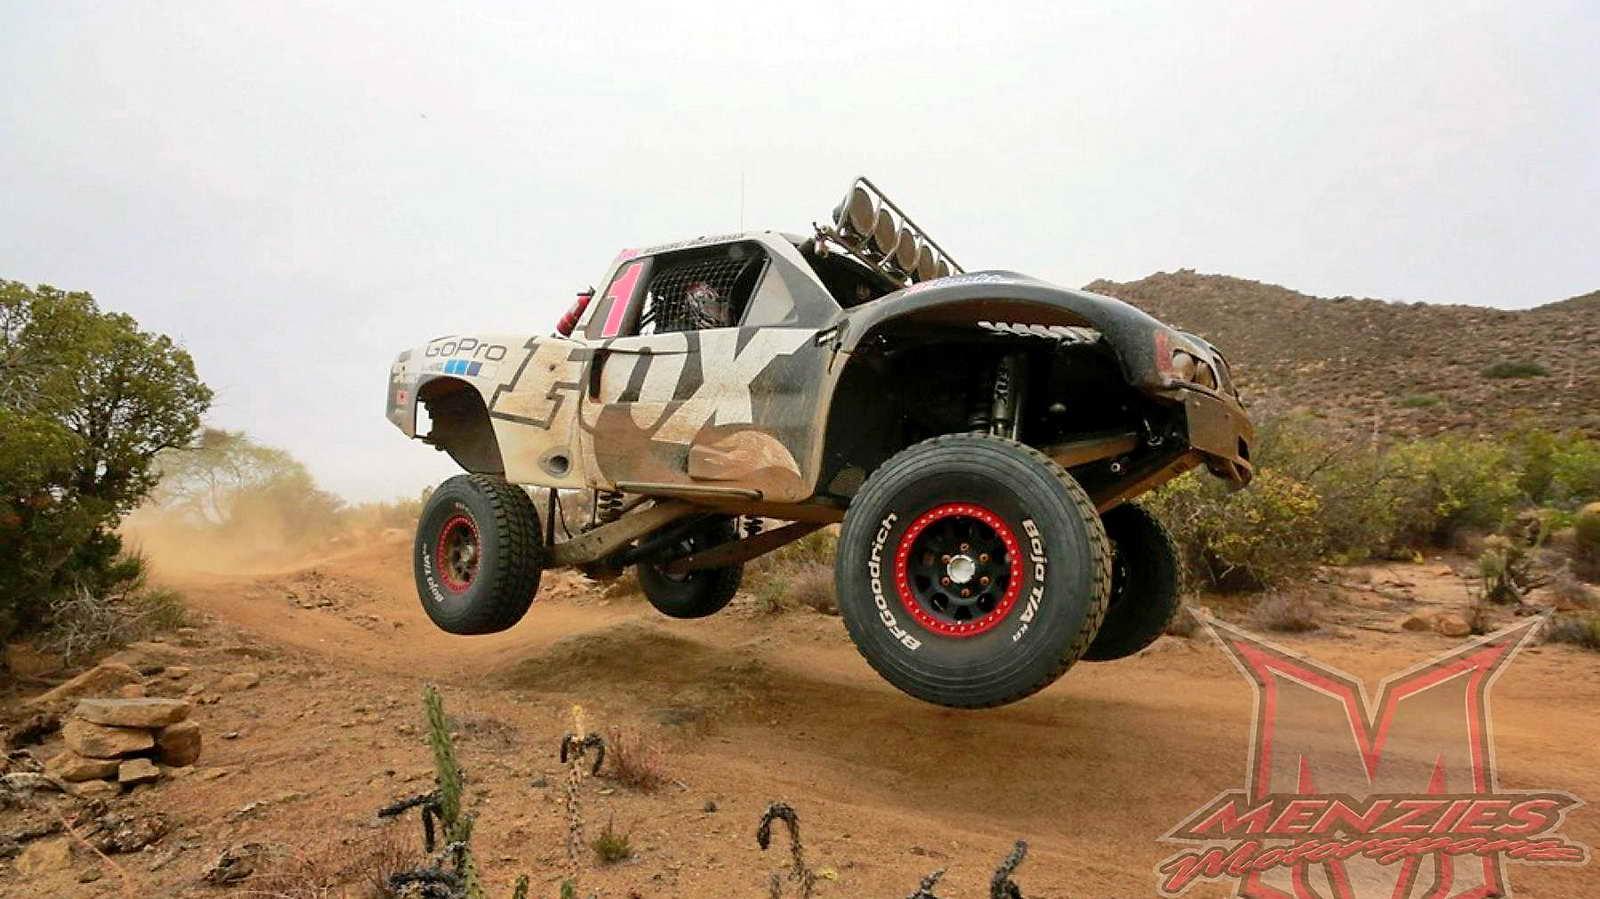 Baja_1000_ Menzies_Motorsports_01